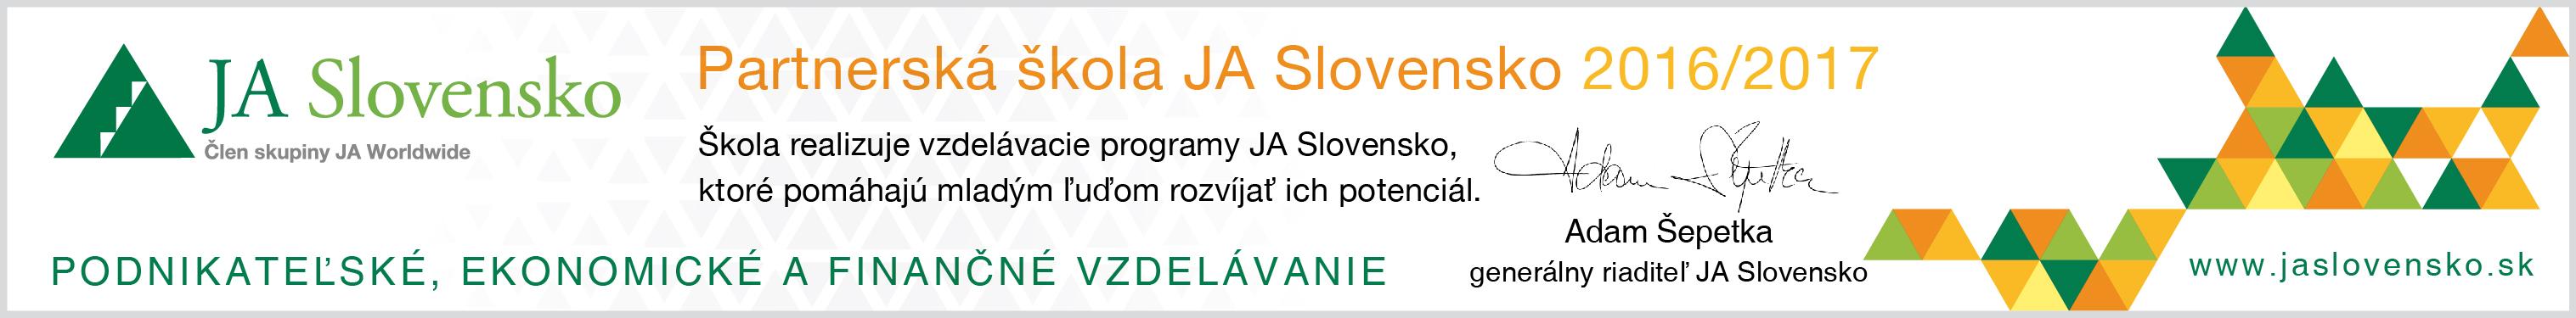 Tu sa dostanete na portál Ja Slovensko